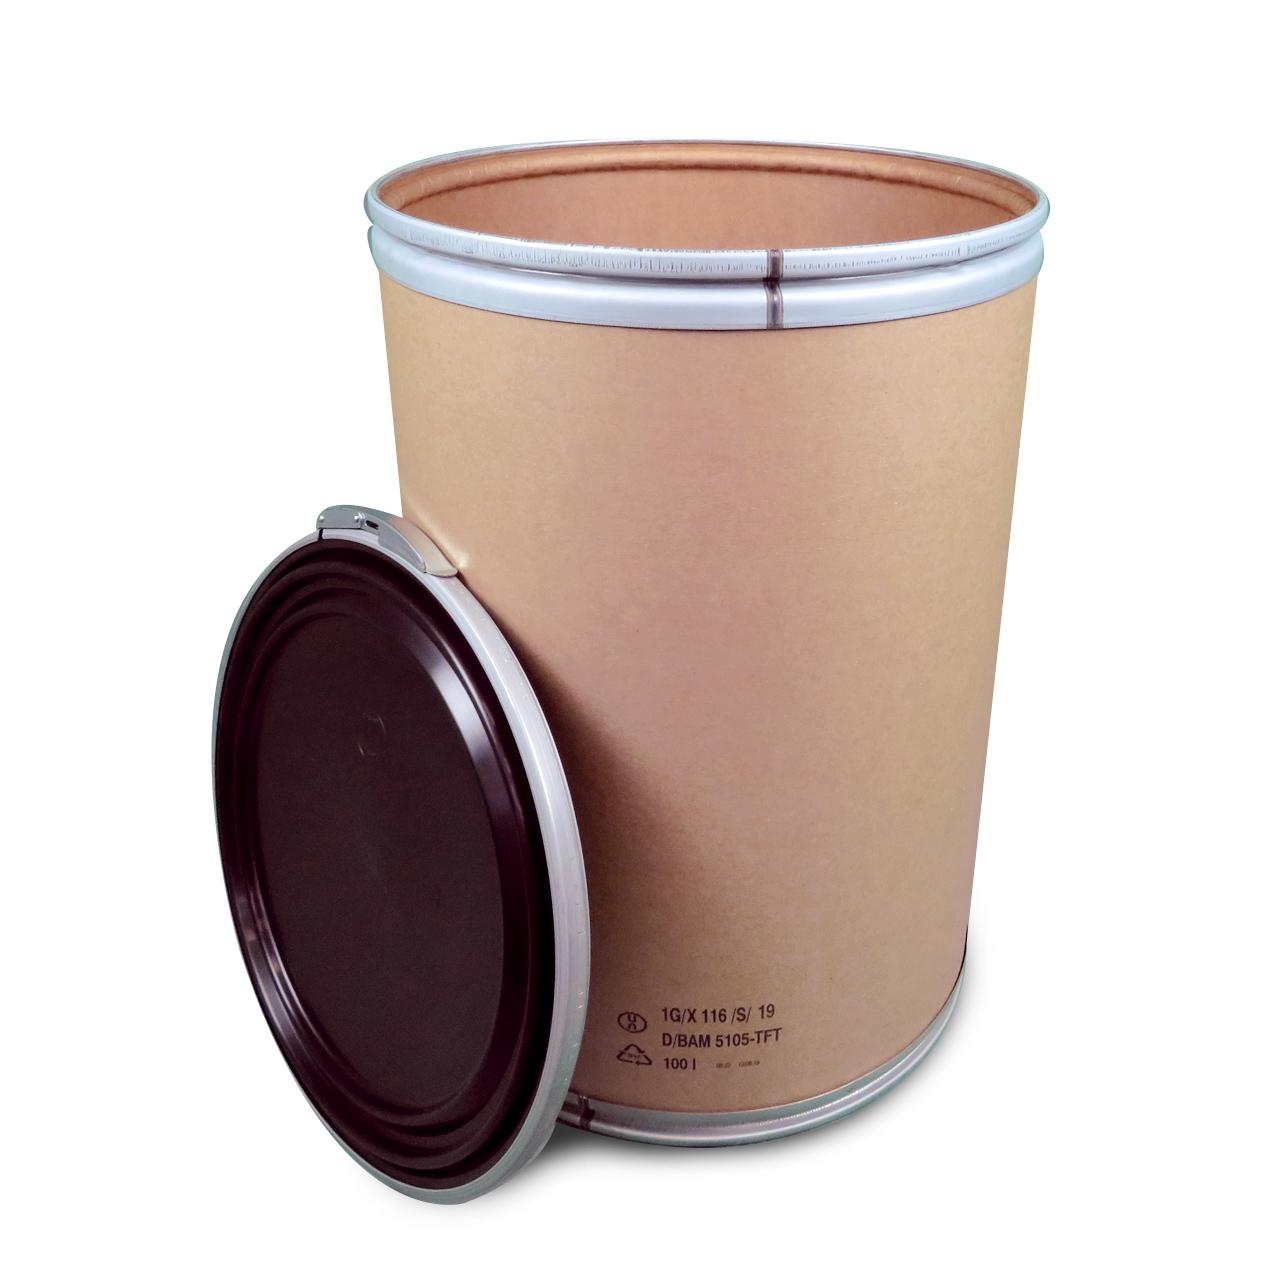 100 L Fibertrommel, Kunststoff-Deckel, UN Gefahrgut - Zulassung